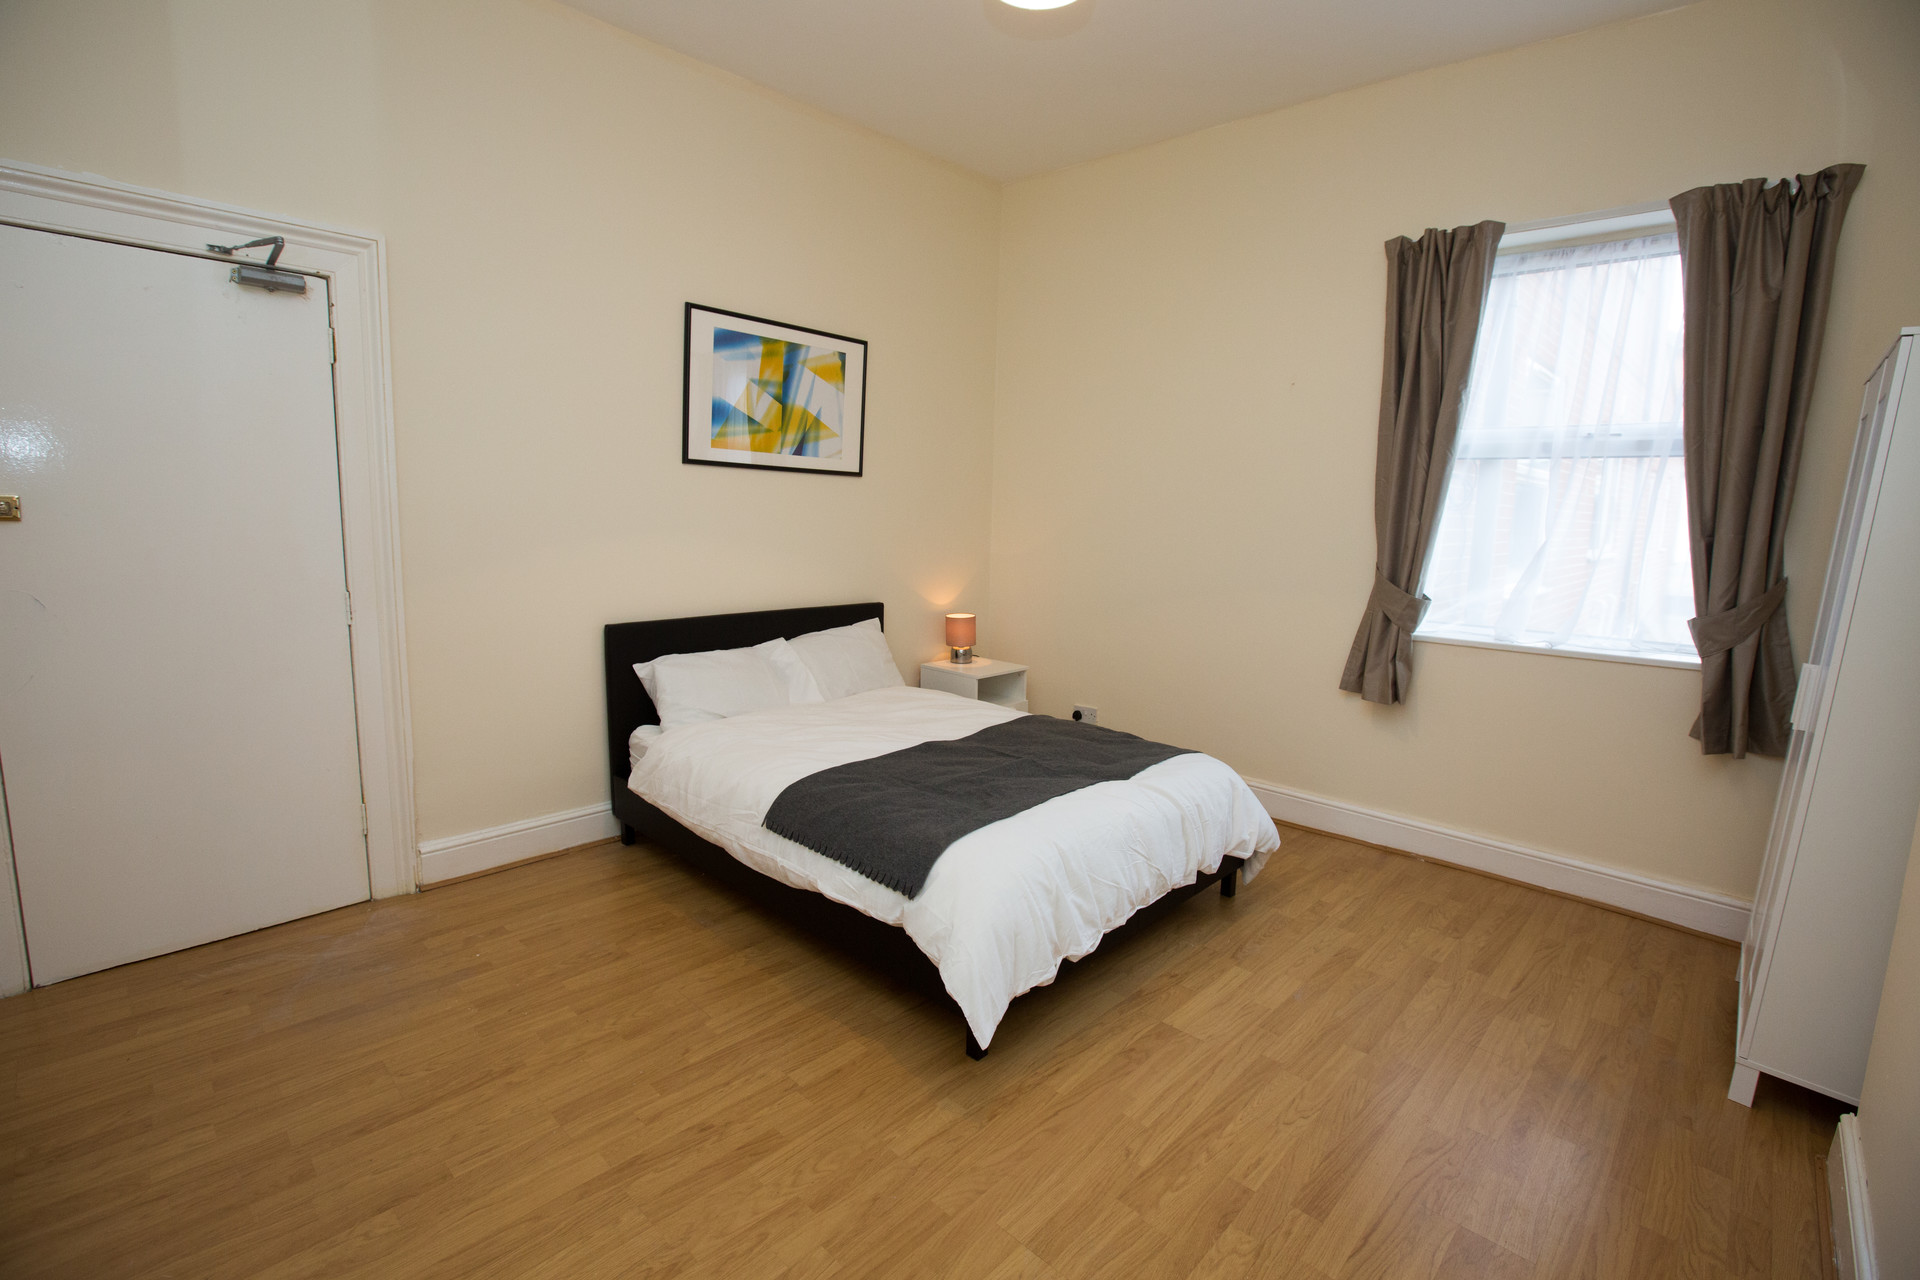 Great House - Portswood